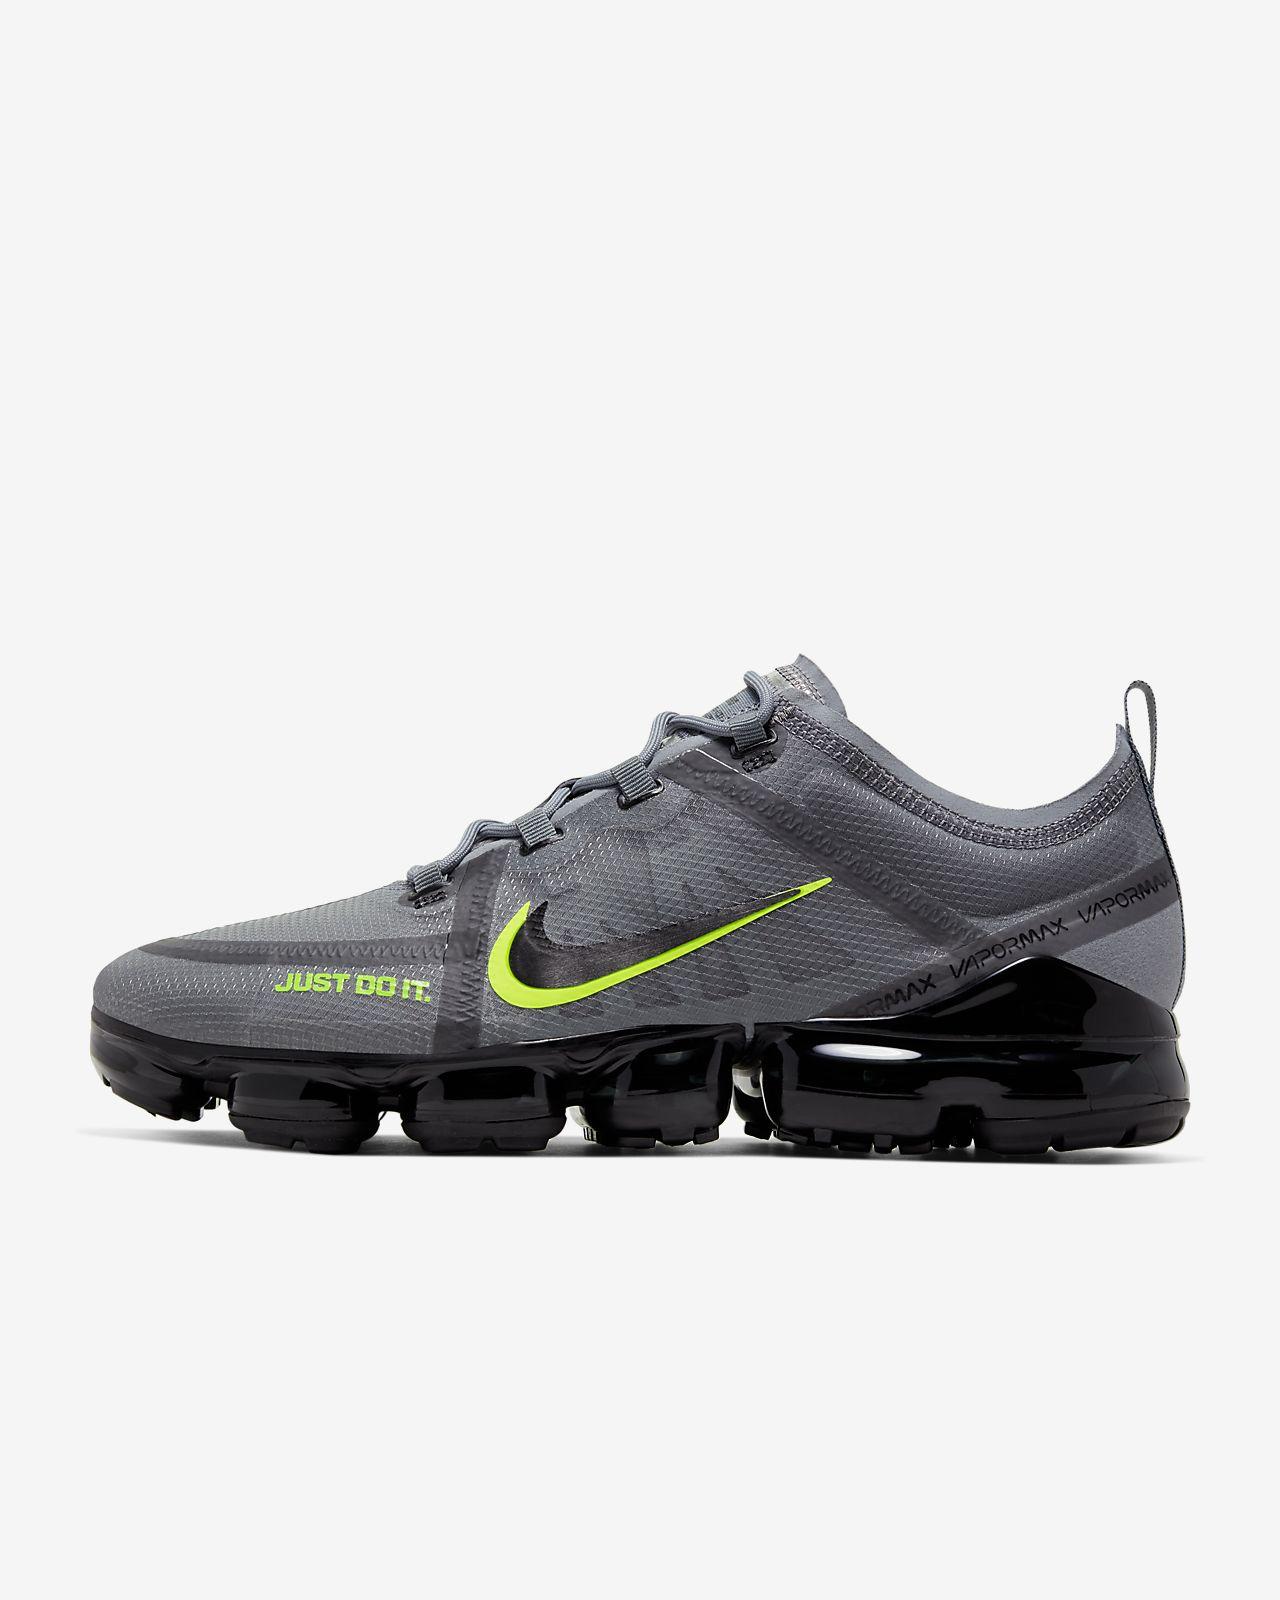 Calzado para hombre Nike Air VaporMax 2019 DRT